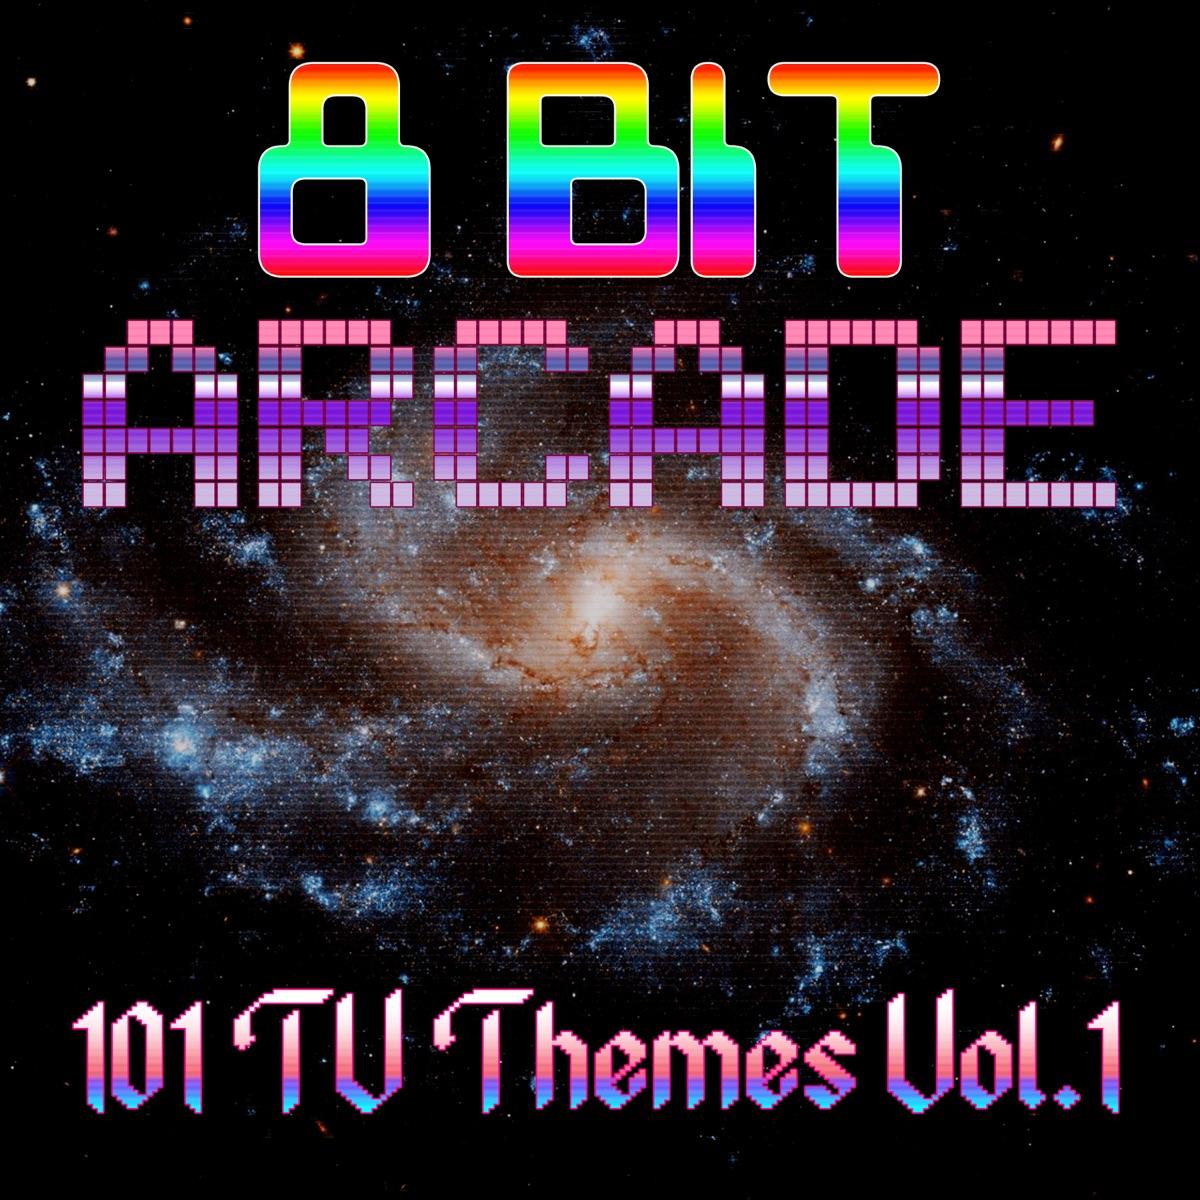 101 Television Themes Vol 1 8-Bit Arcade CD cover